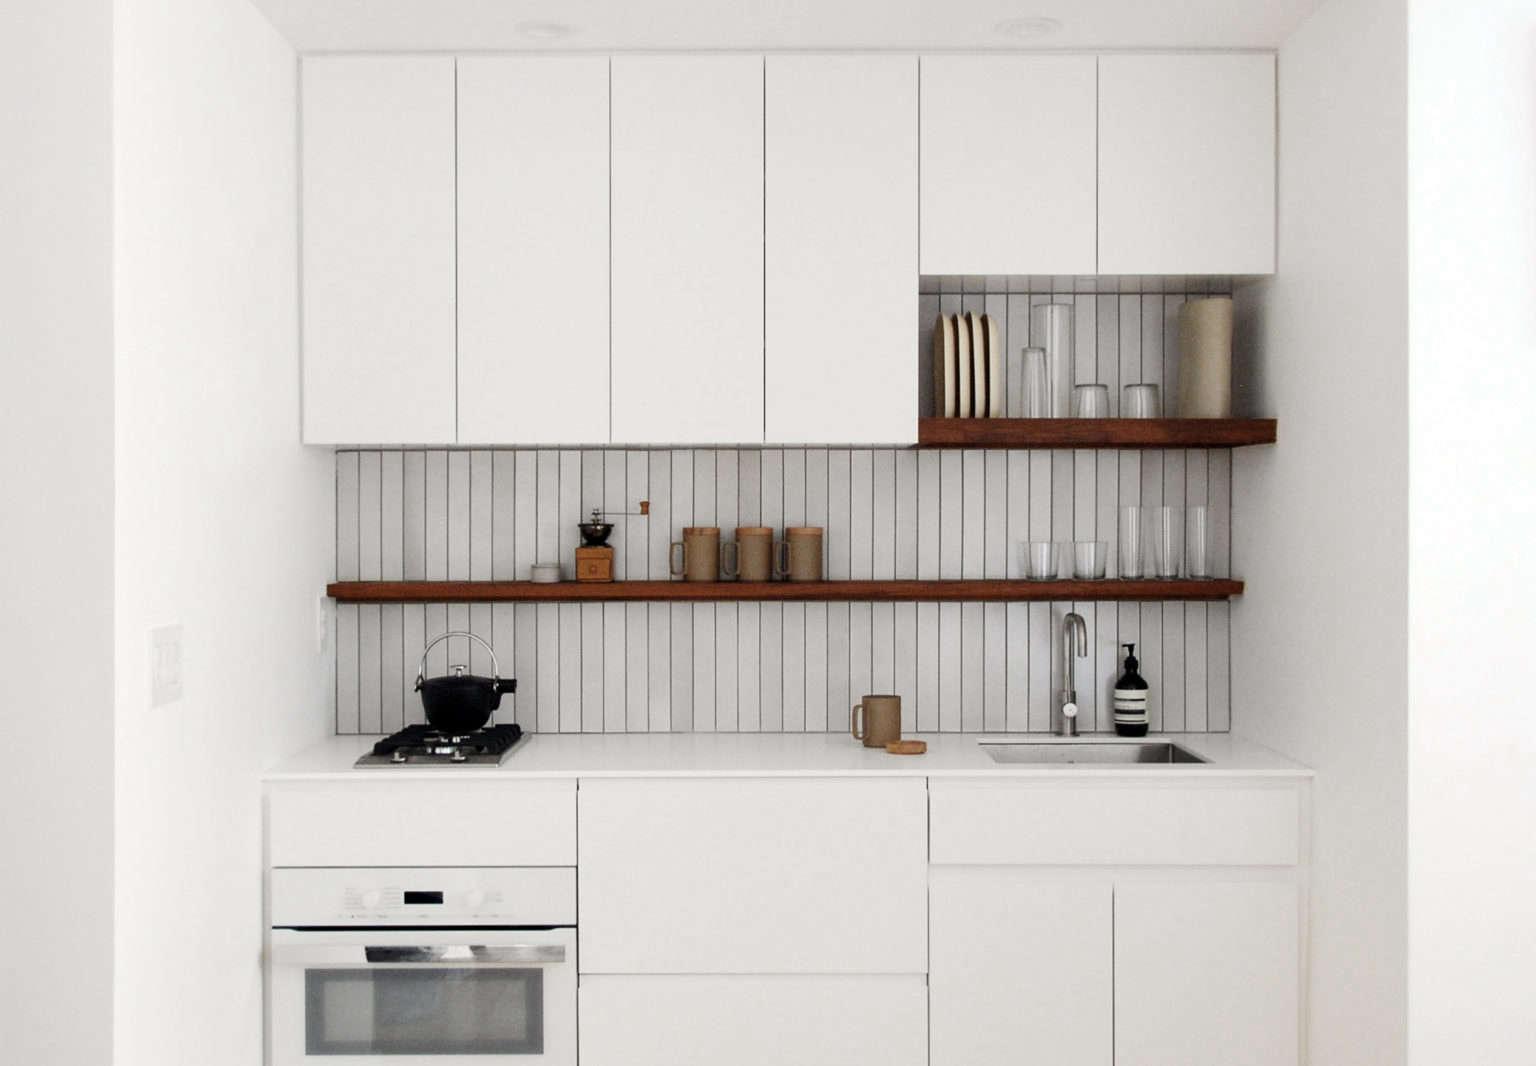 Tiny White Kitchen by Denise Lee